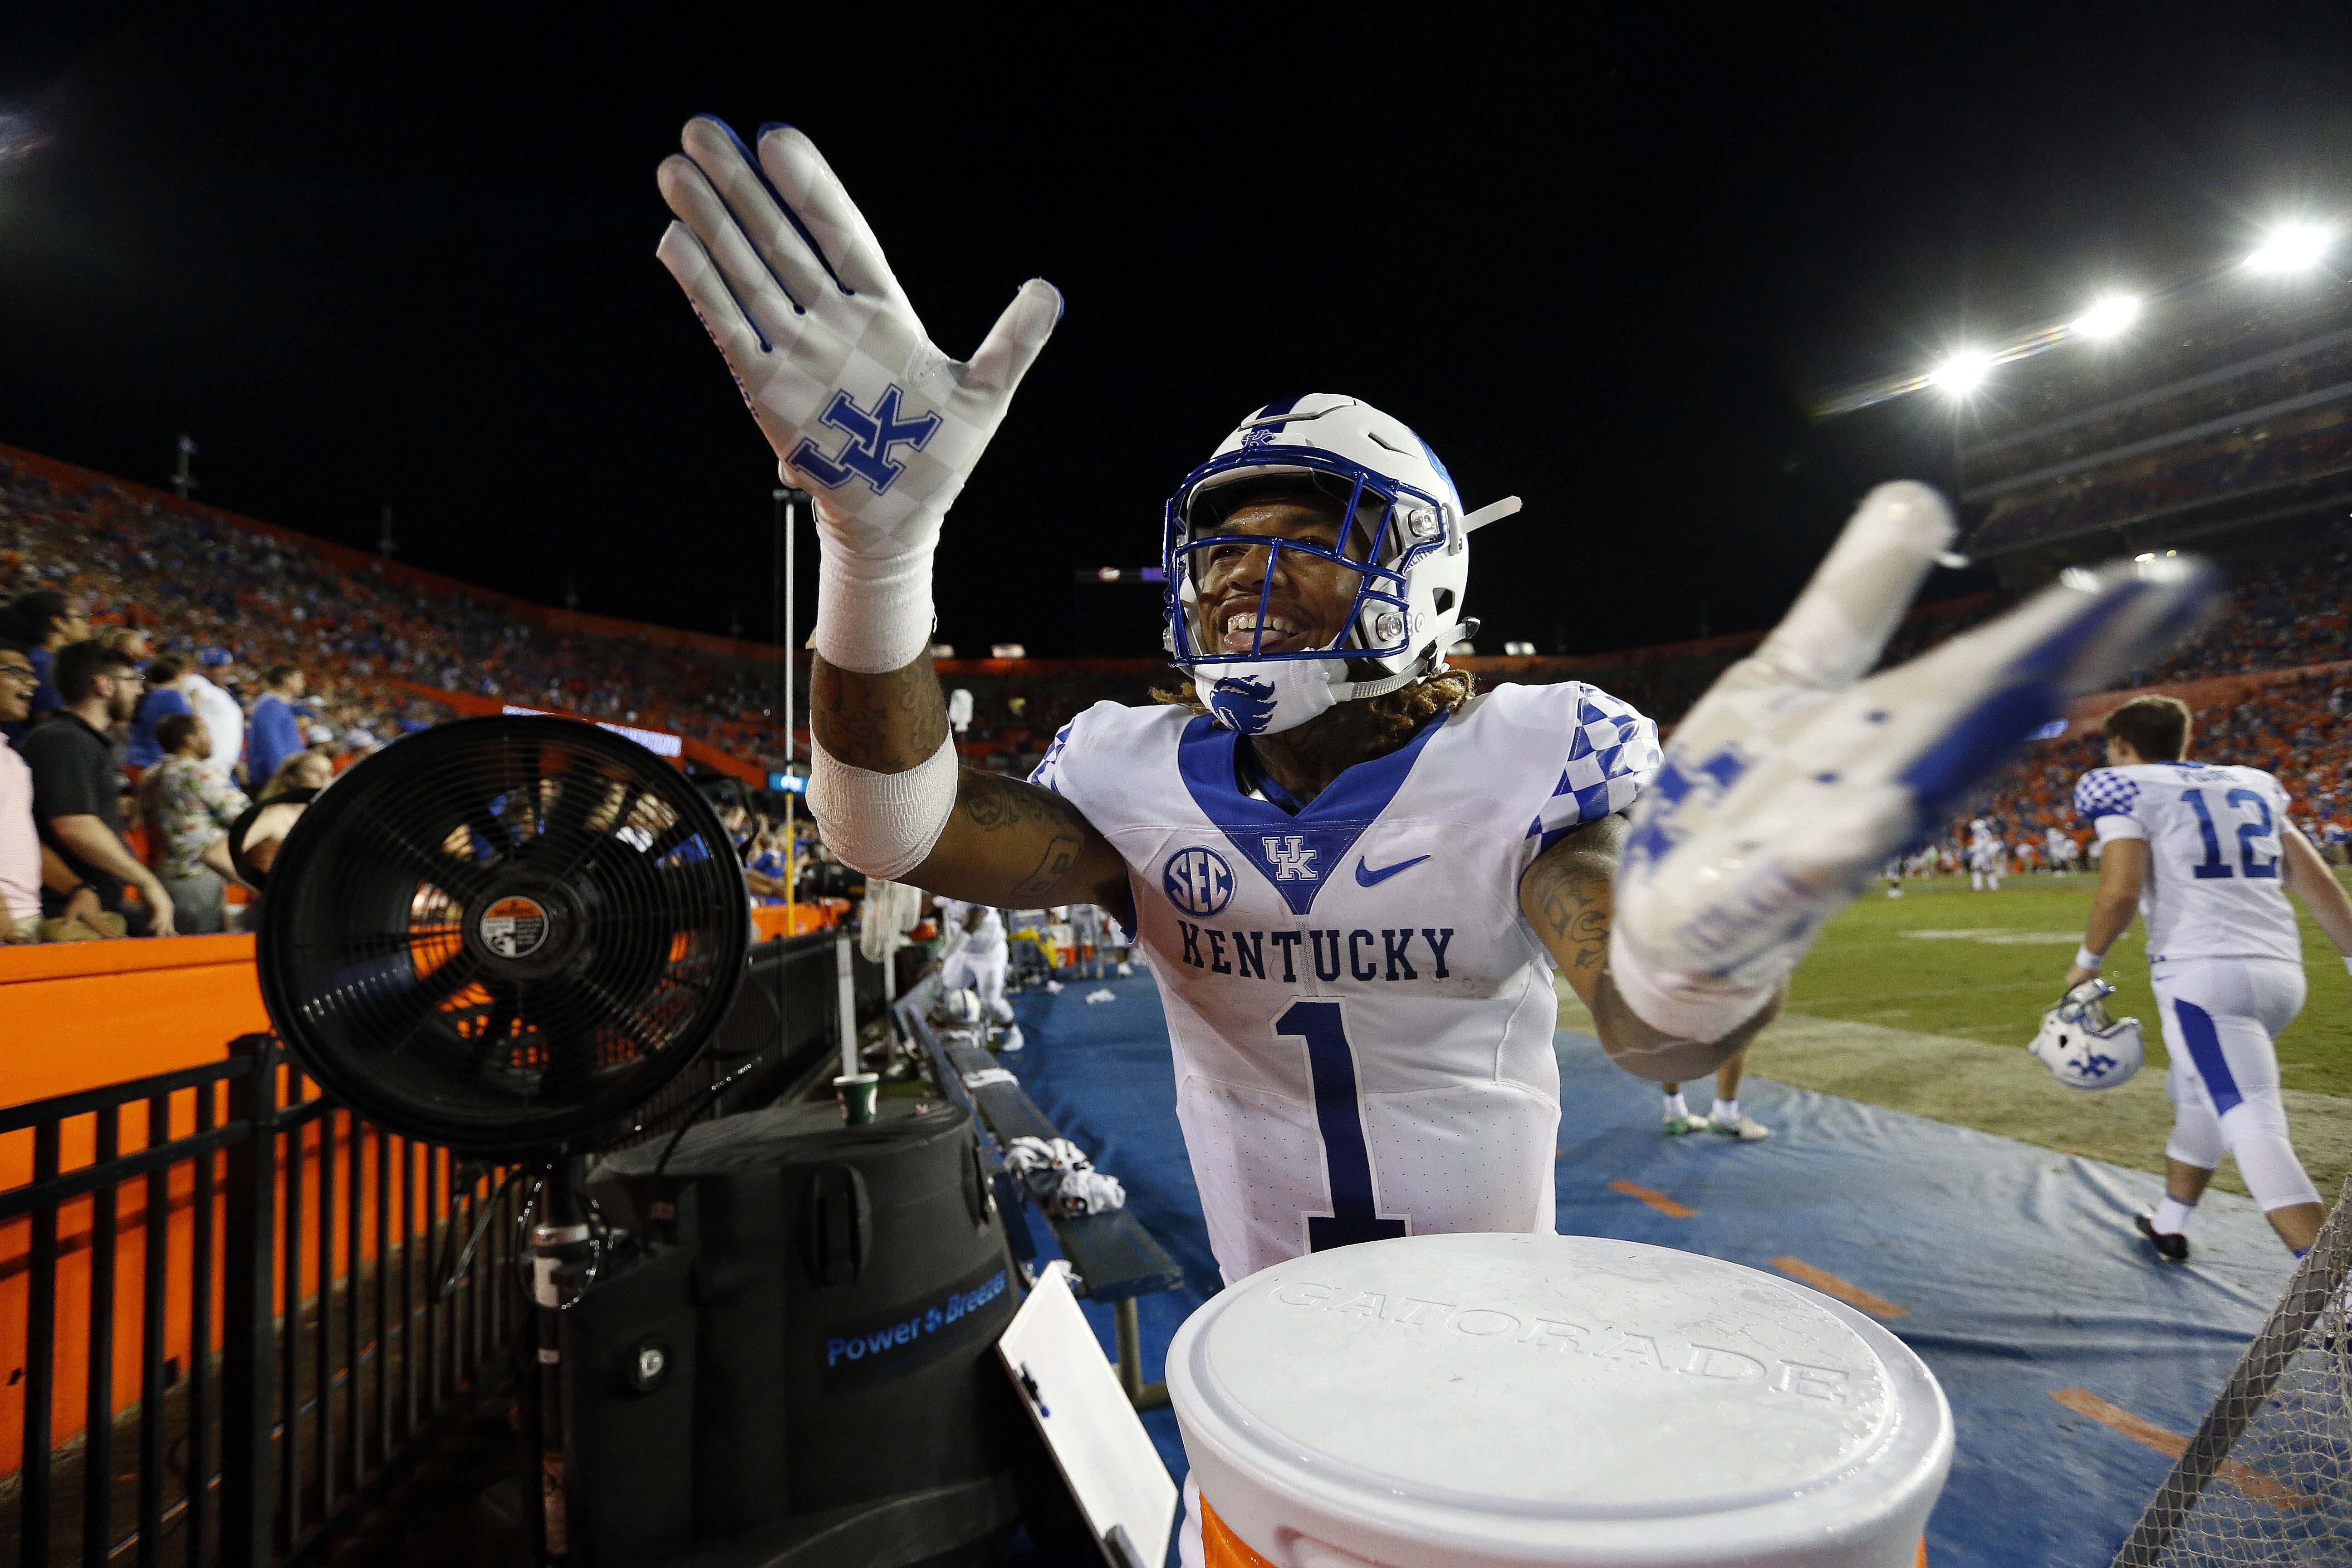 NCAA Football: Kentucky at Florida